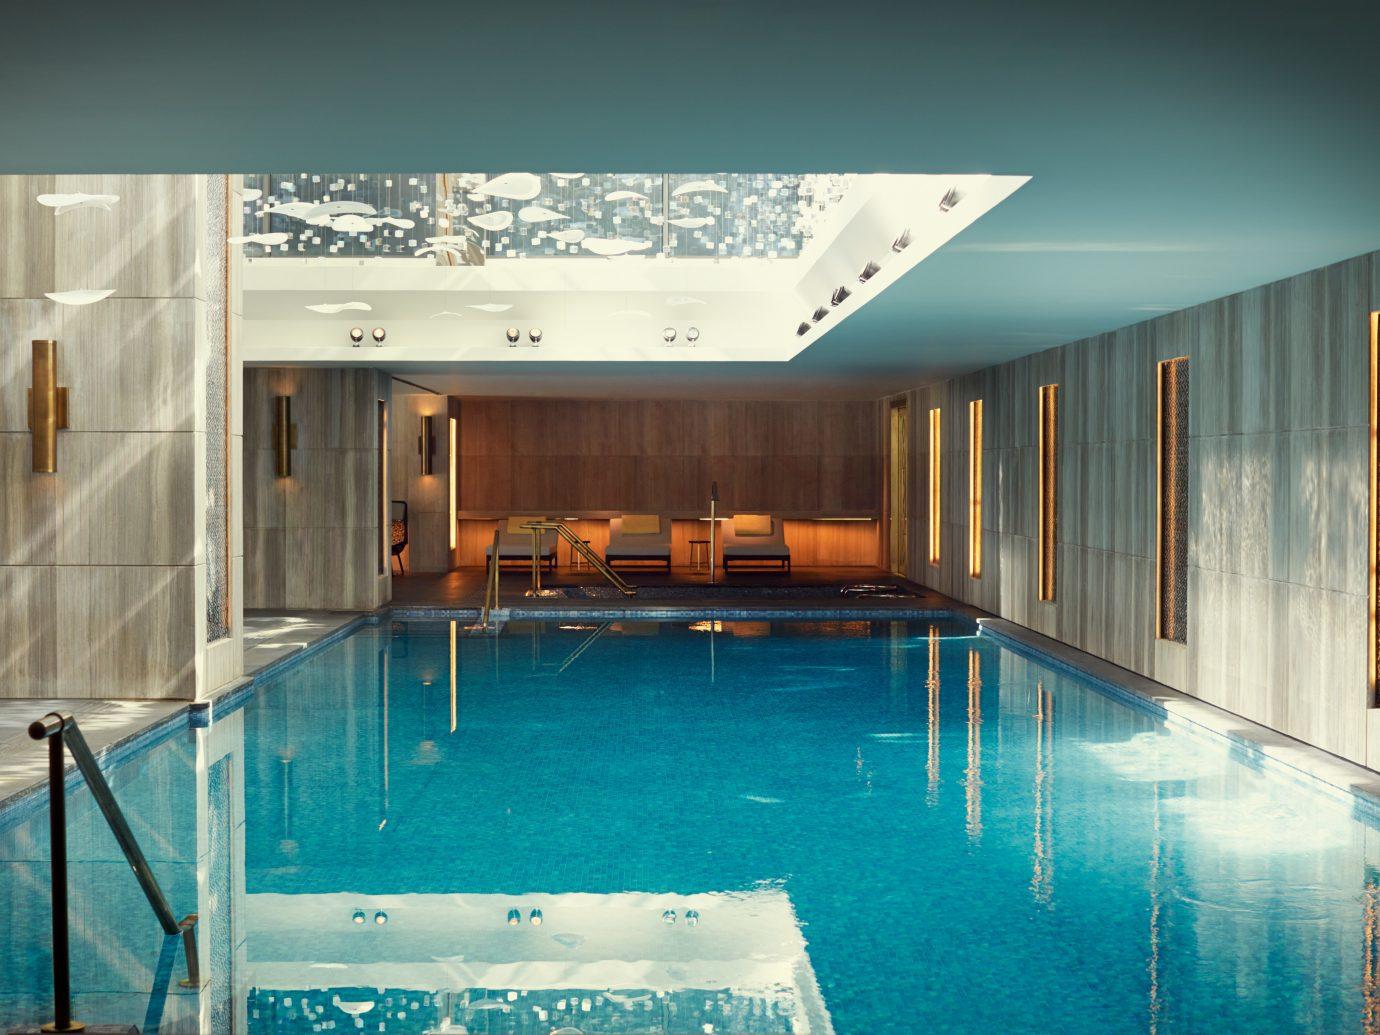 Boutique Hotels Hip Hotels Lounge Luxury Luxury Travel Modern Pool floor indoor swimming pool property room estate leisure centre interior design home blue real estate condominium Design mansion Resort